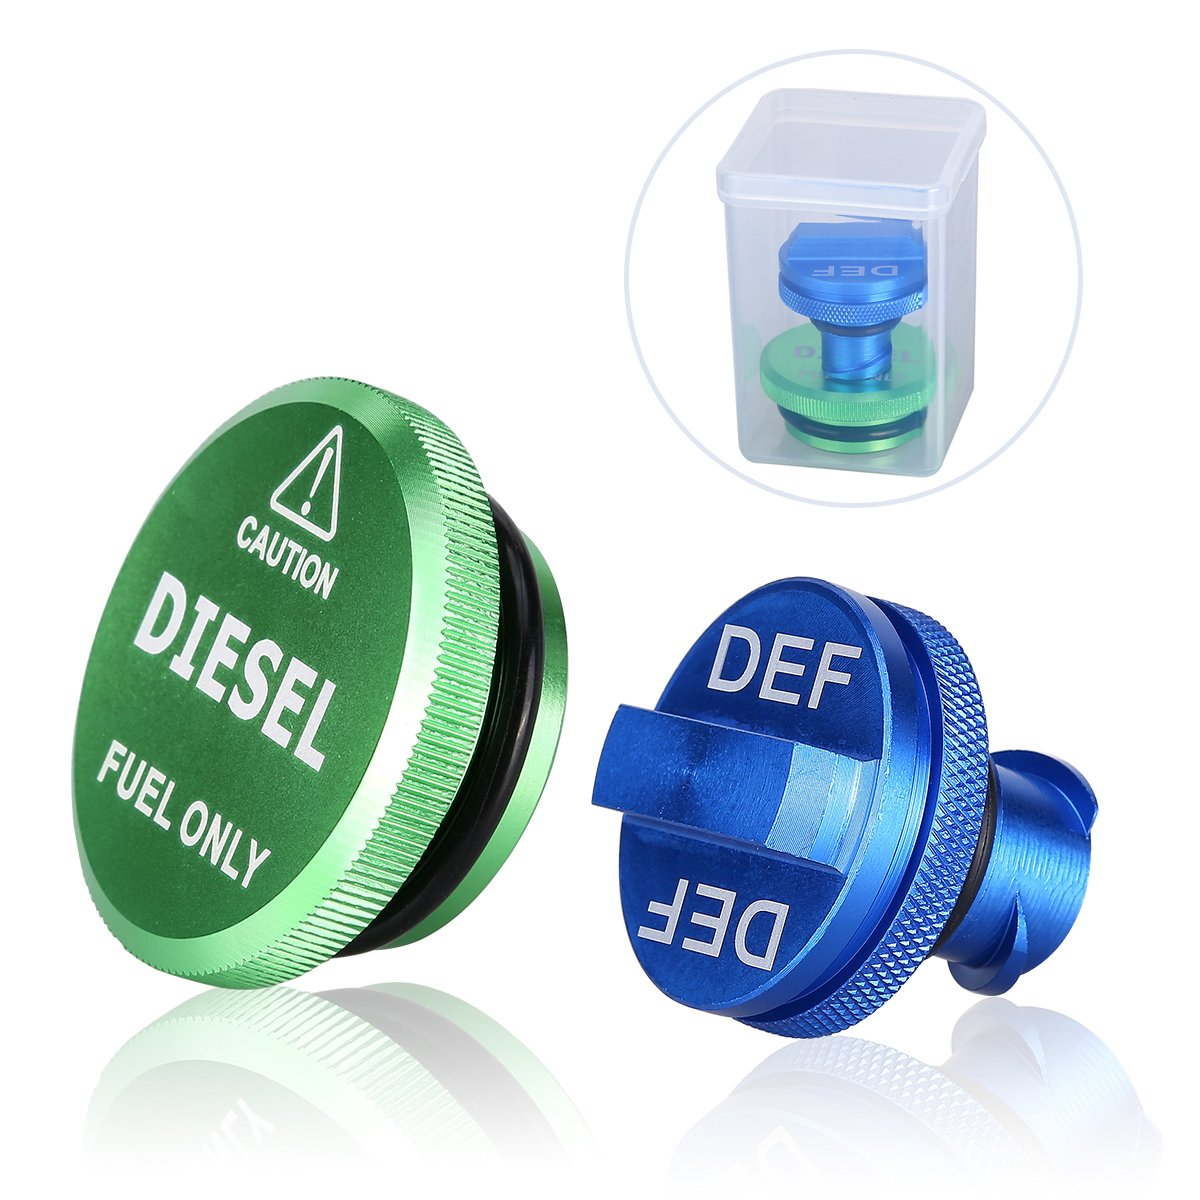 Magnetic Green Diesel Fuel Cap and Blue RAM DEF Cap for 2013-2017 Dodge Ram Diesel Trucks 1500 2500 3500 Fuel Tank Caps DEF Caps Packs by WEITRON